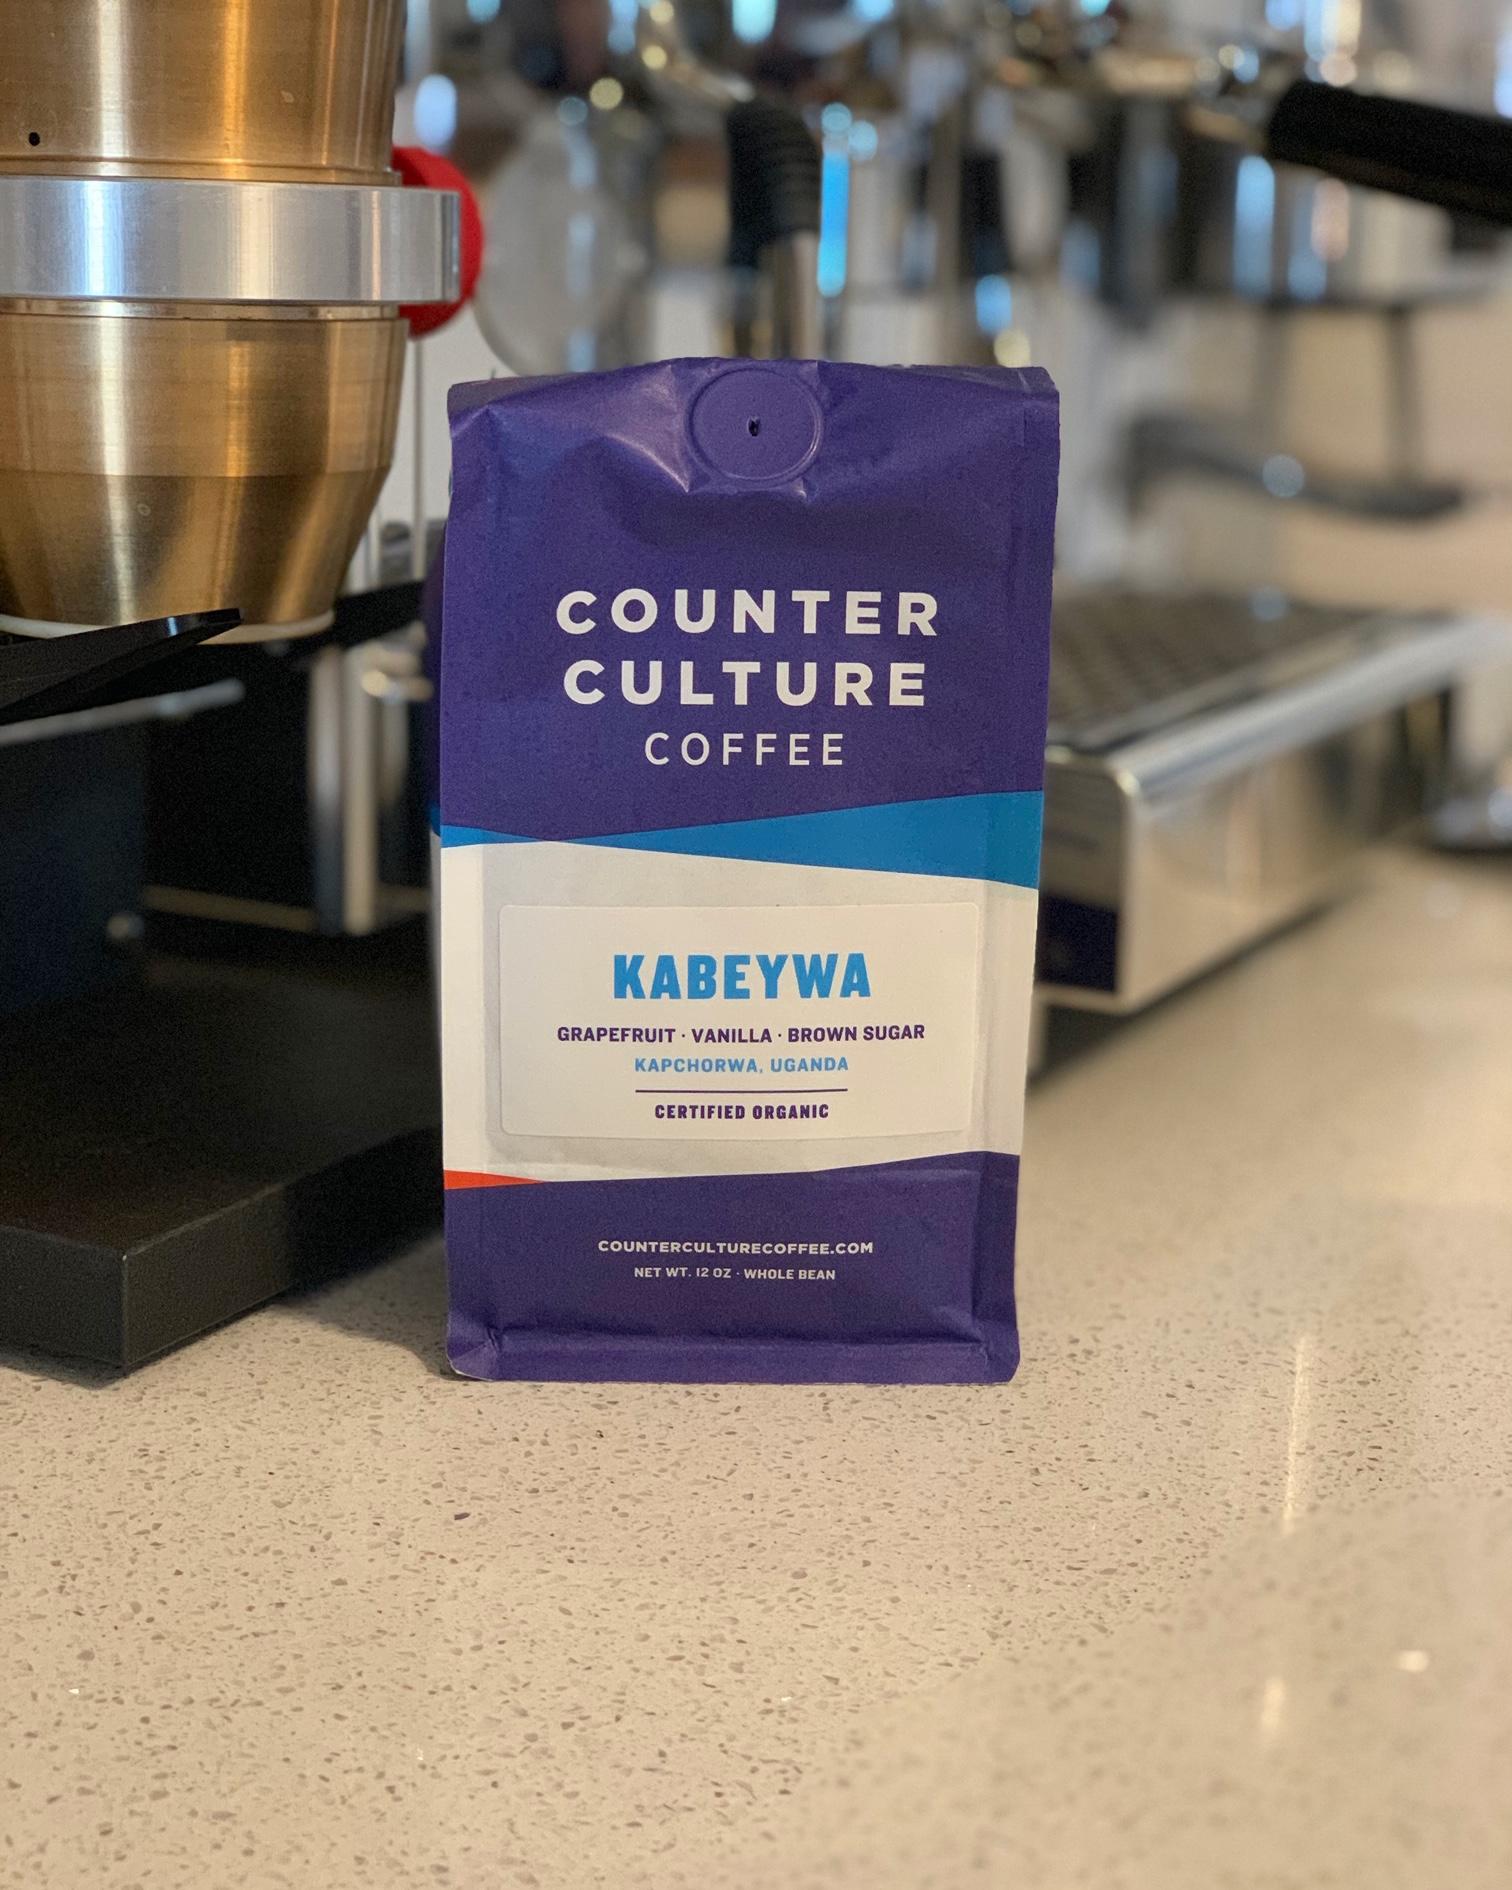 Counter Culture Coffee Uganda Washed.JPG